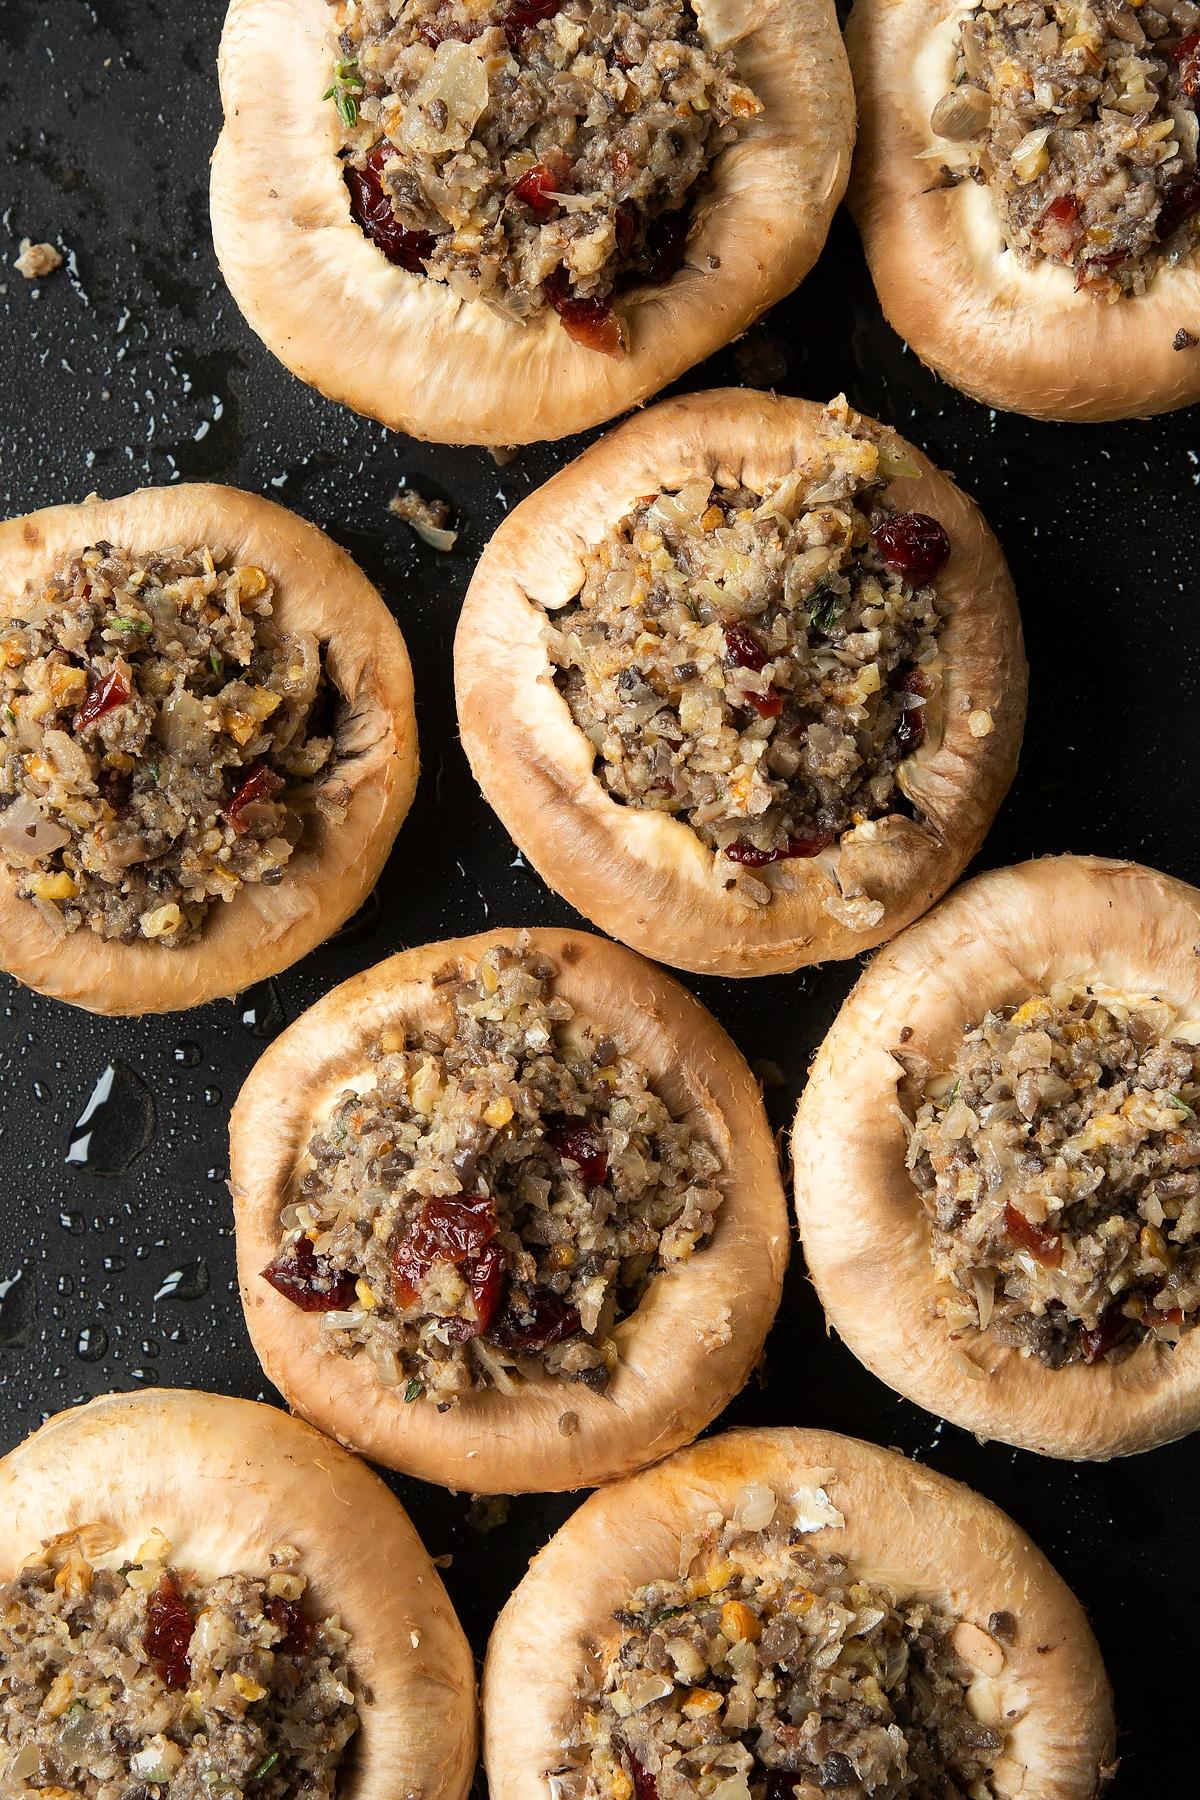 Overhead shot of filling inside mushrooms on a baking tray